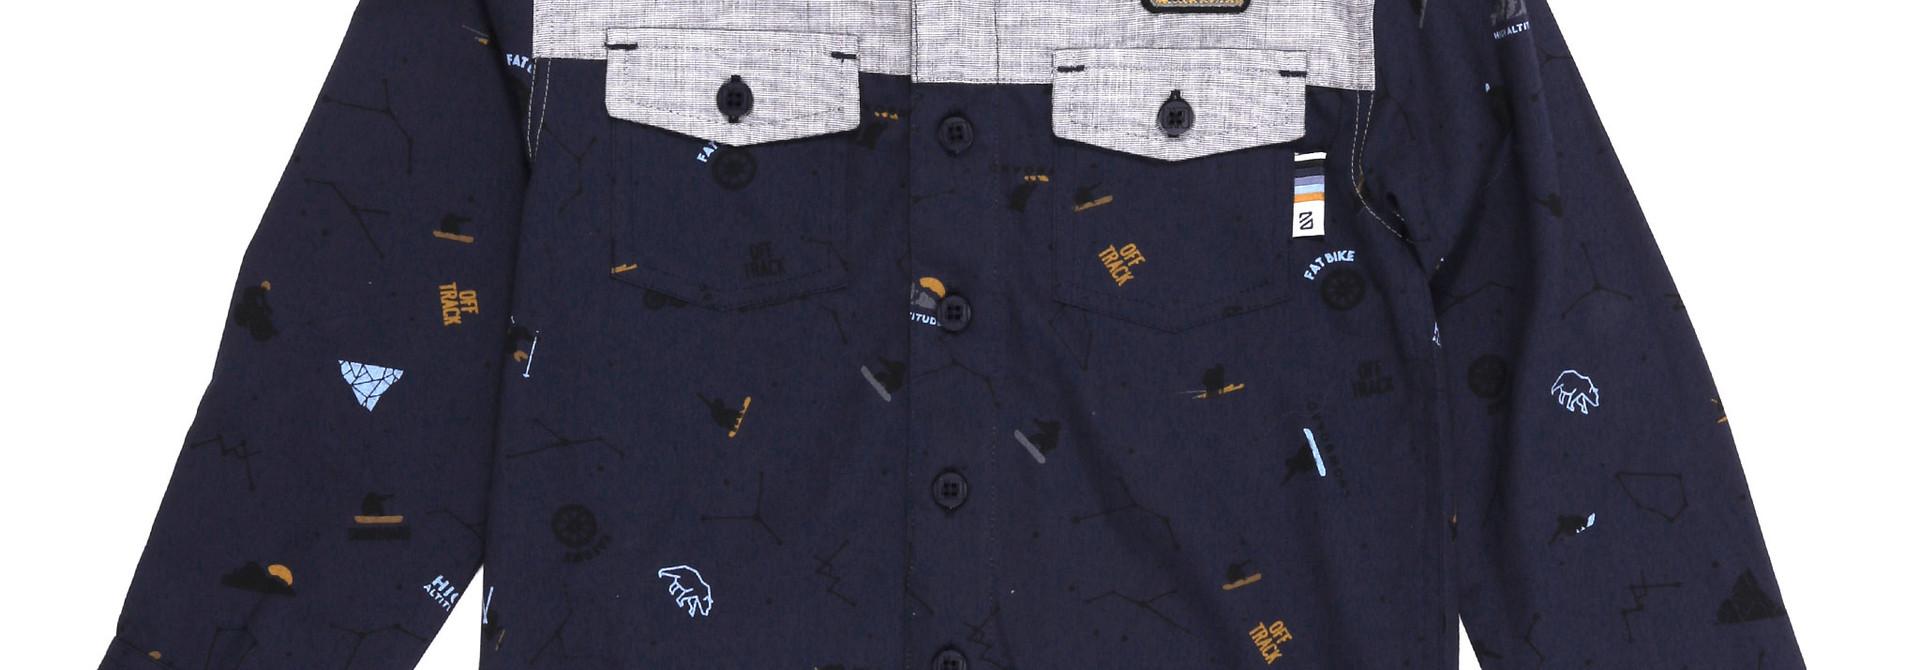 Chemise à capuchon - Haute Altitude